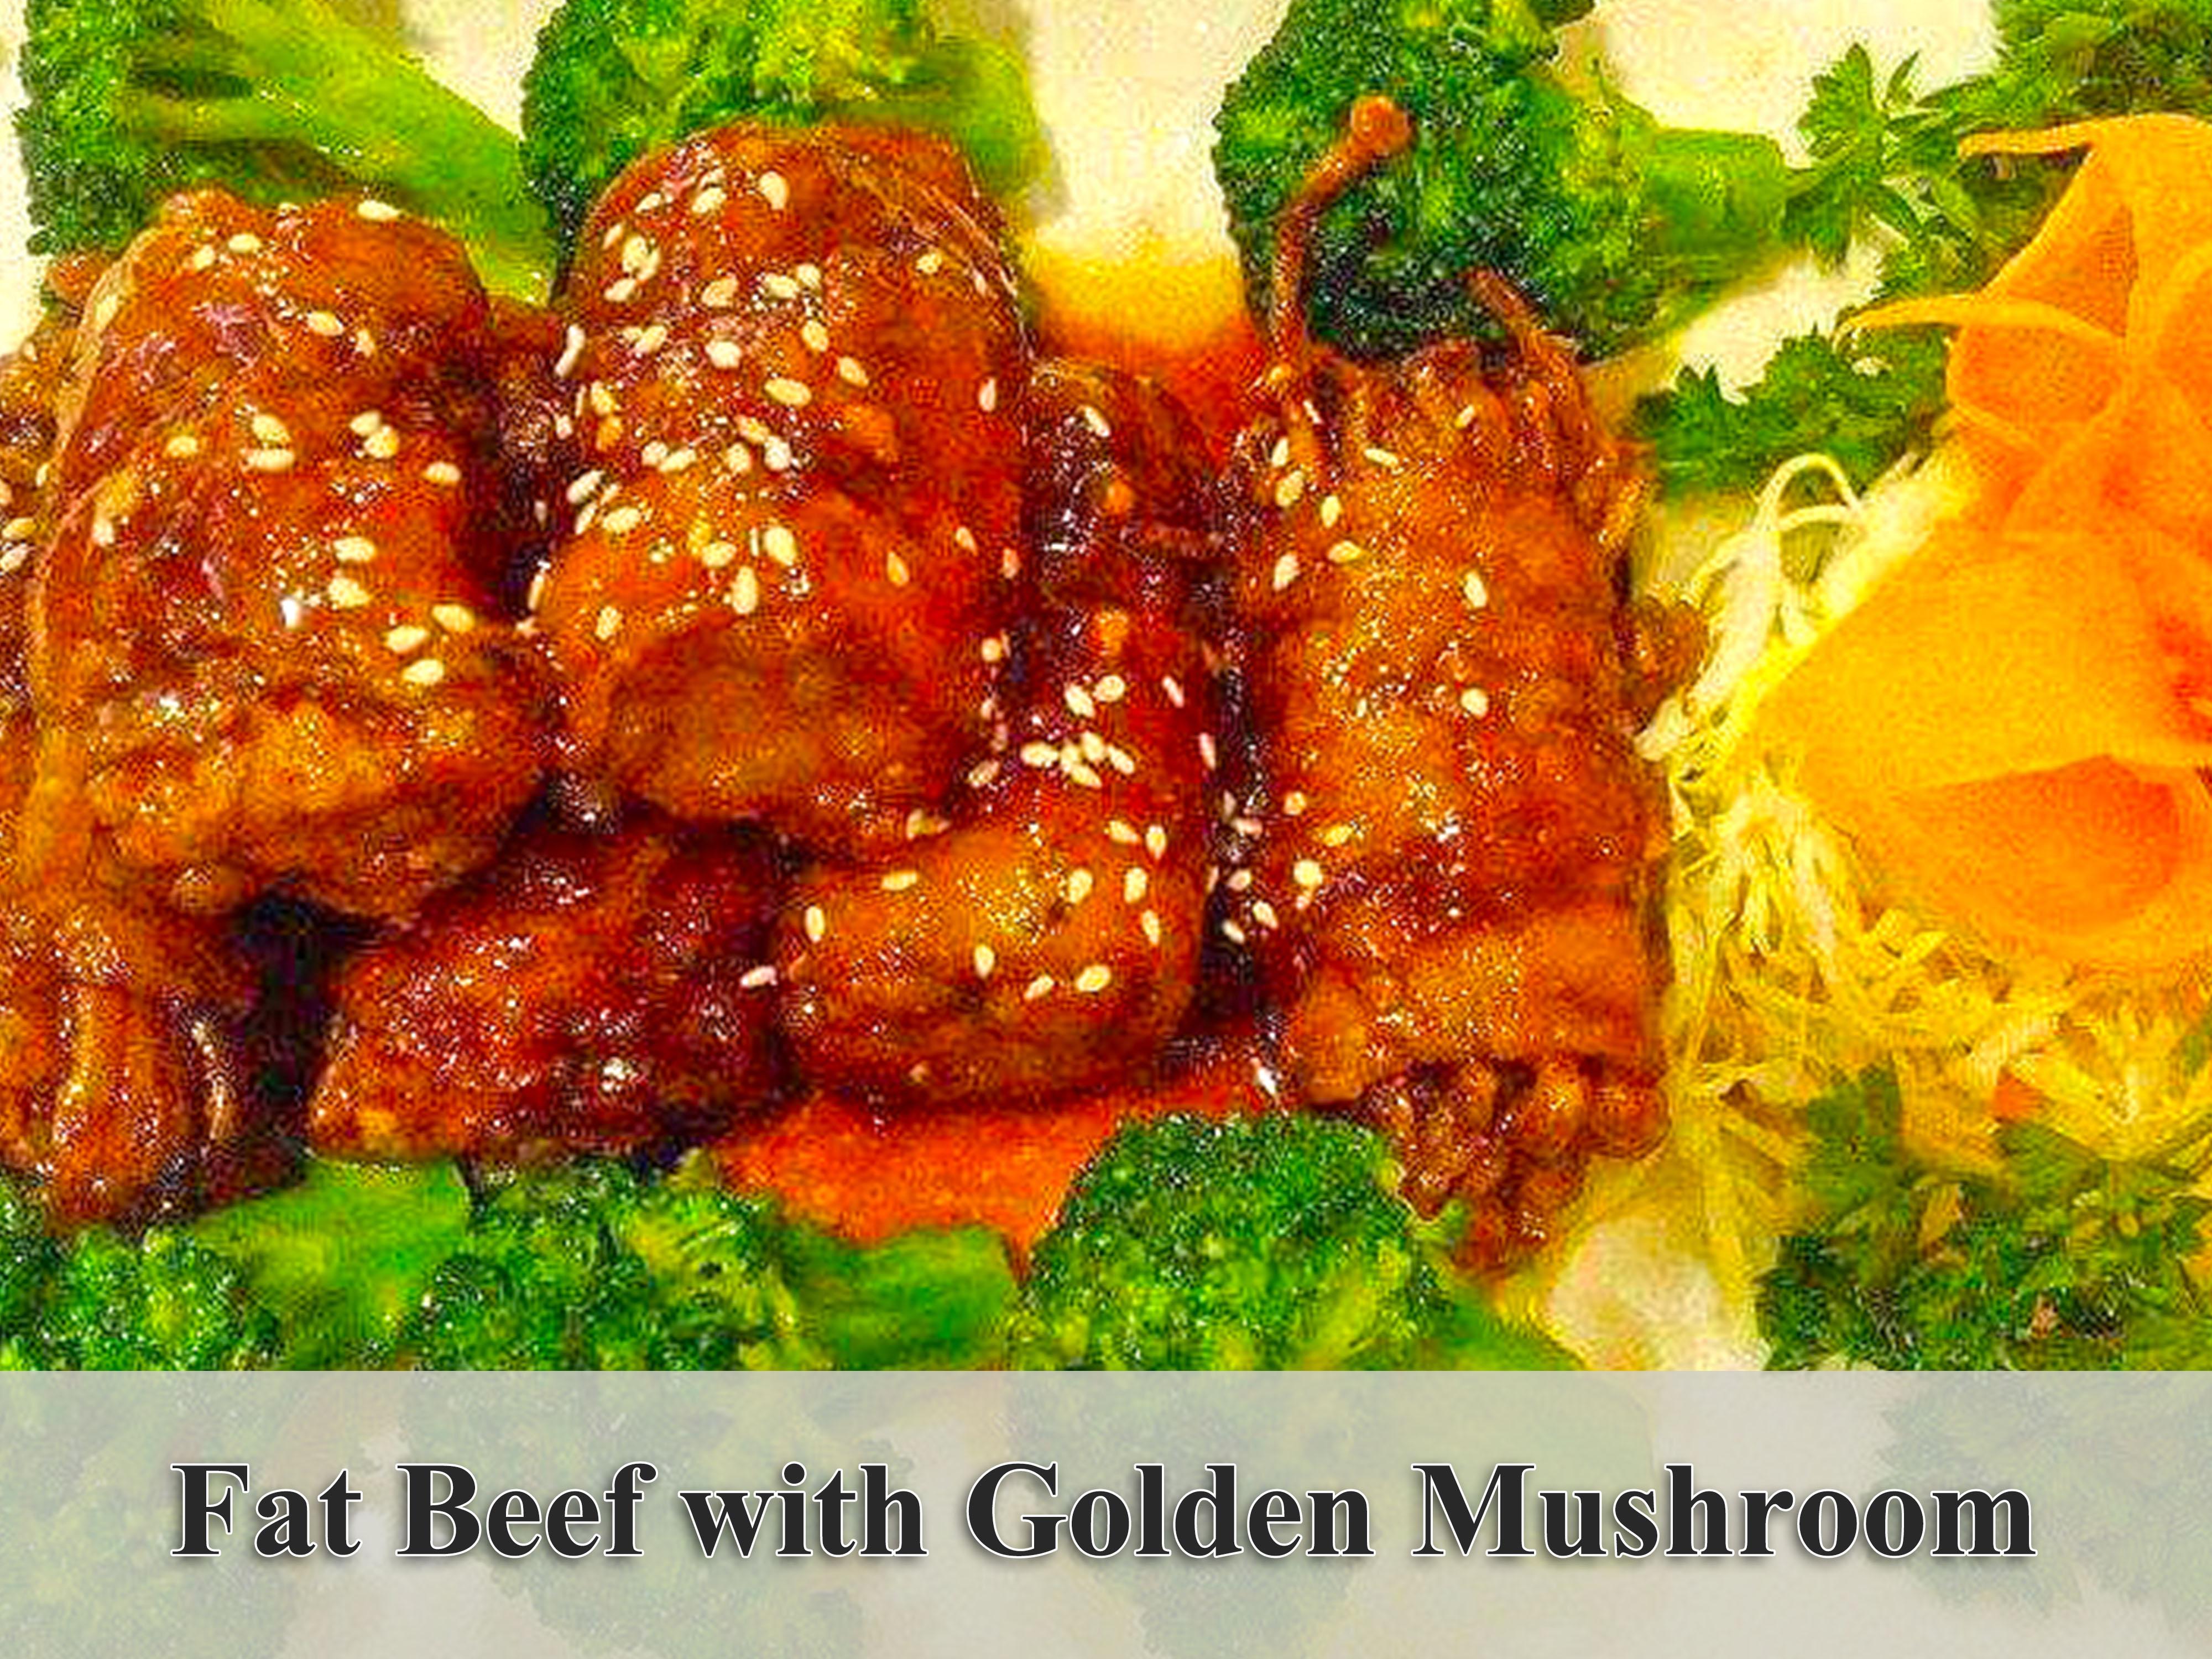 Fat Beef with Golden Mushroom